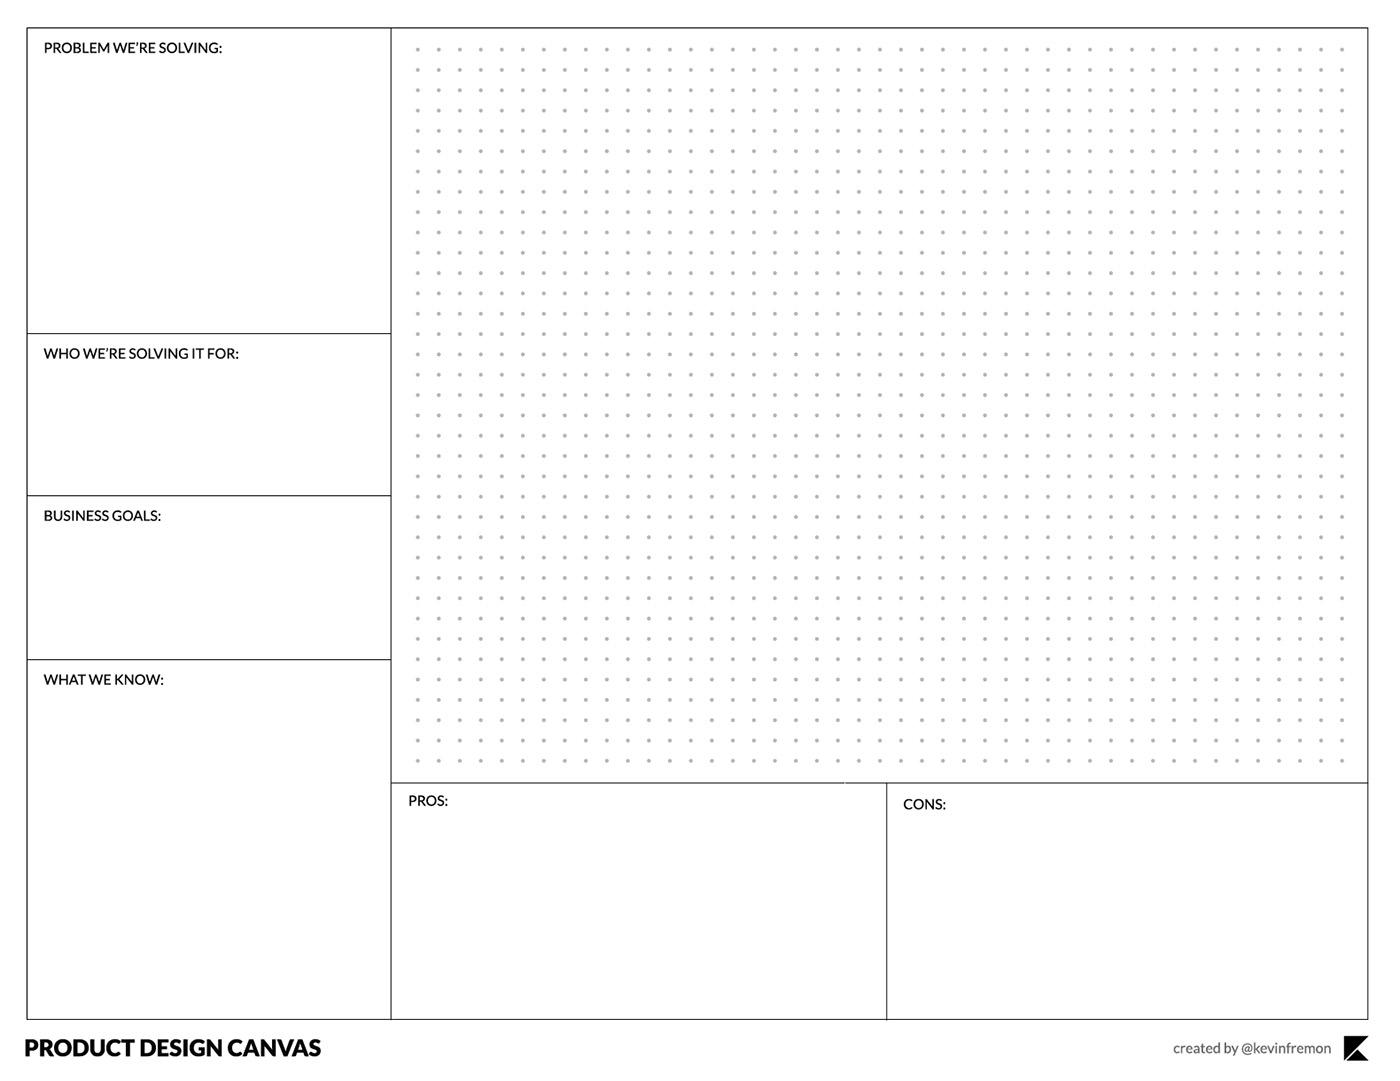 product-design-canvas-by-@kevinfremon